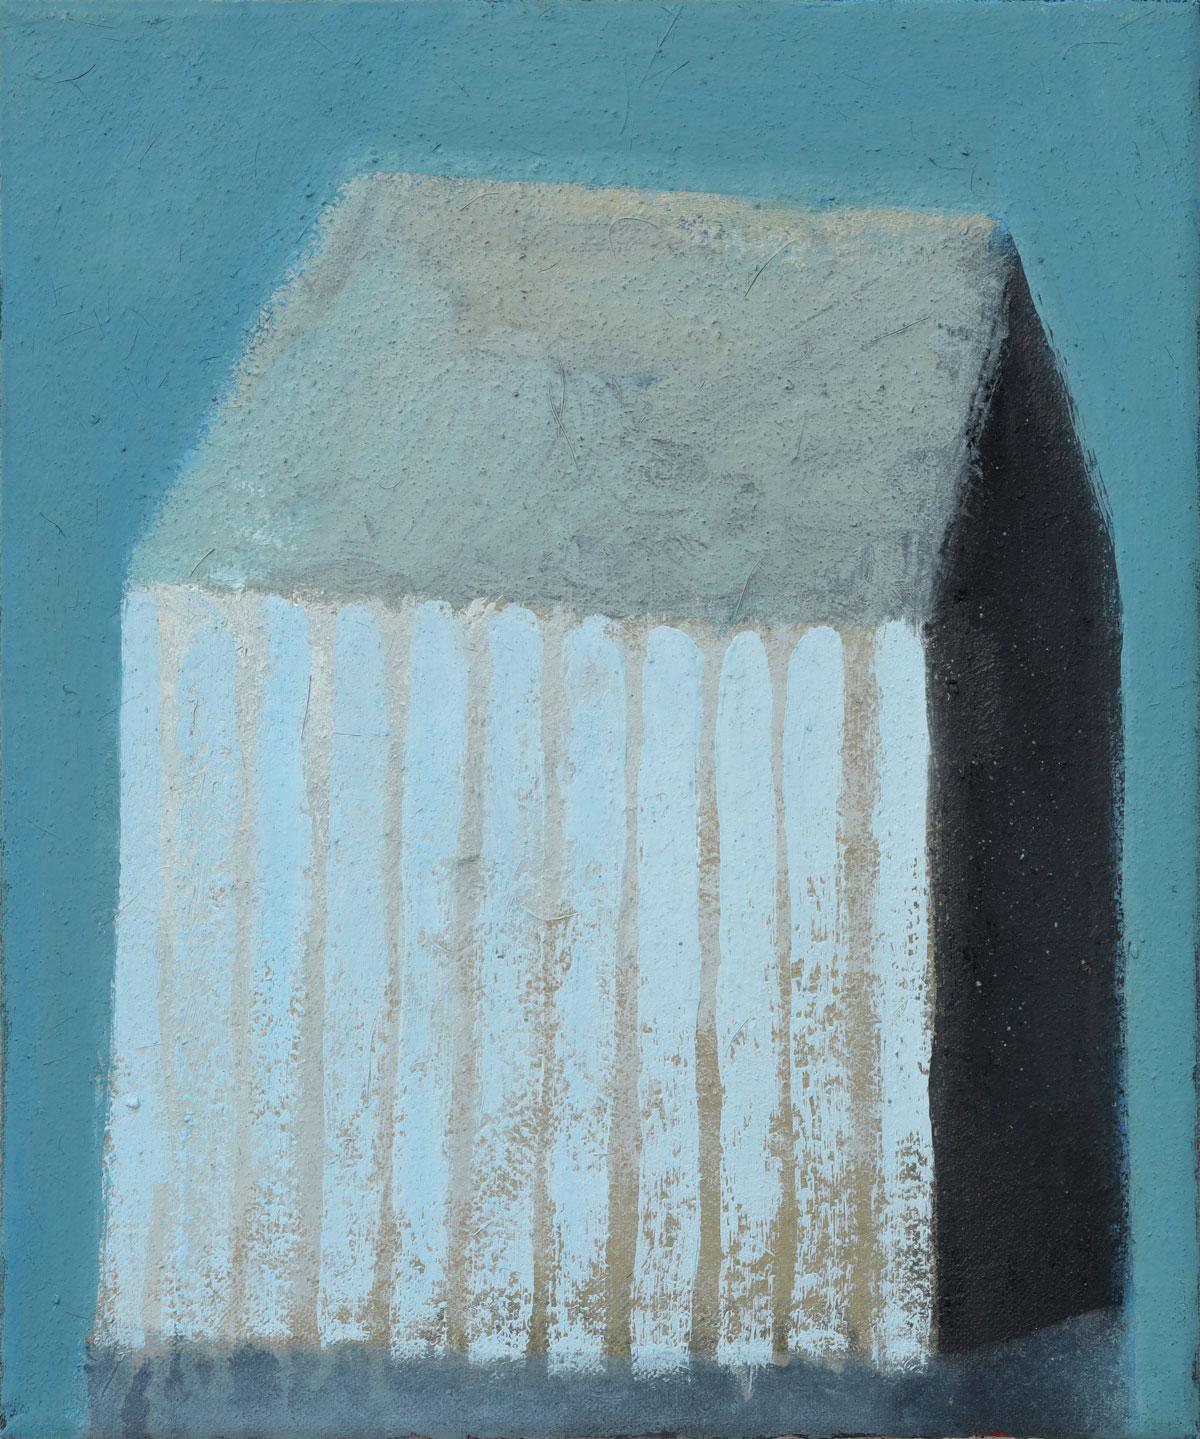 Streifenhaus Blau-Grau | 2020 | Öl / Leinwand | 30 × 25 cm